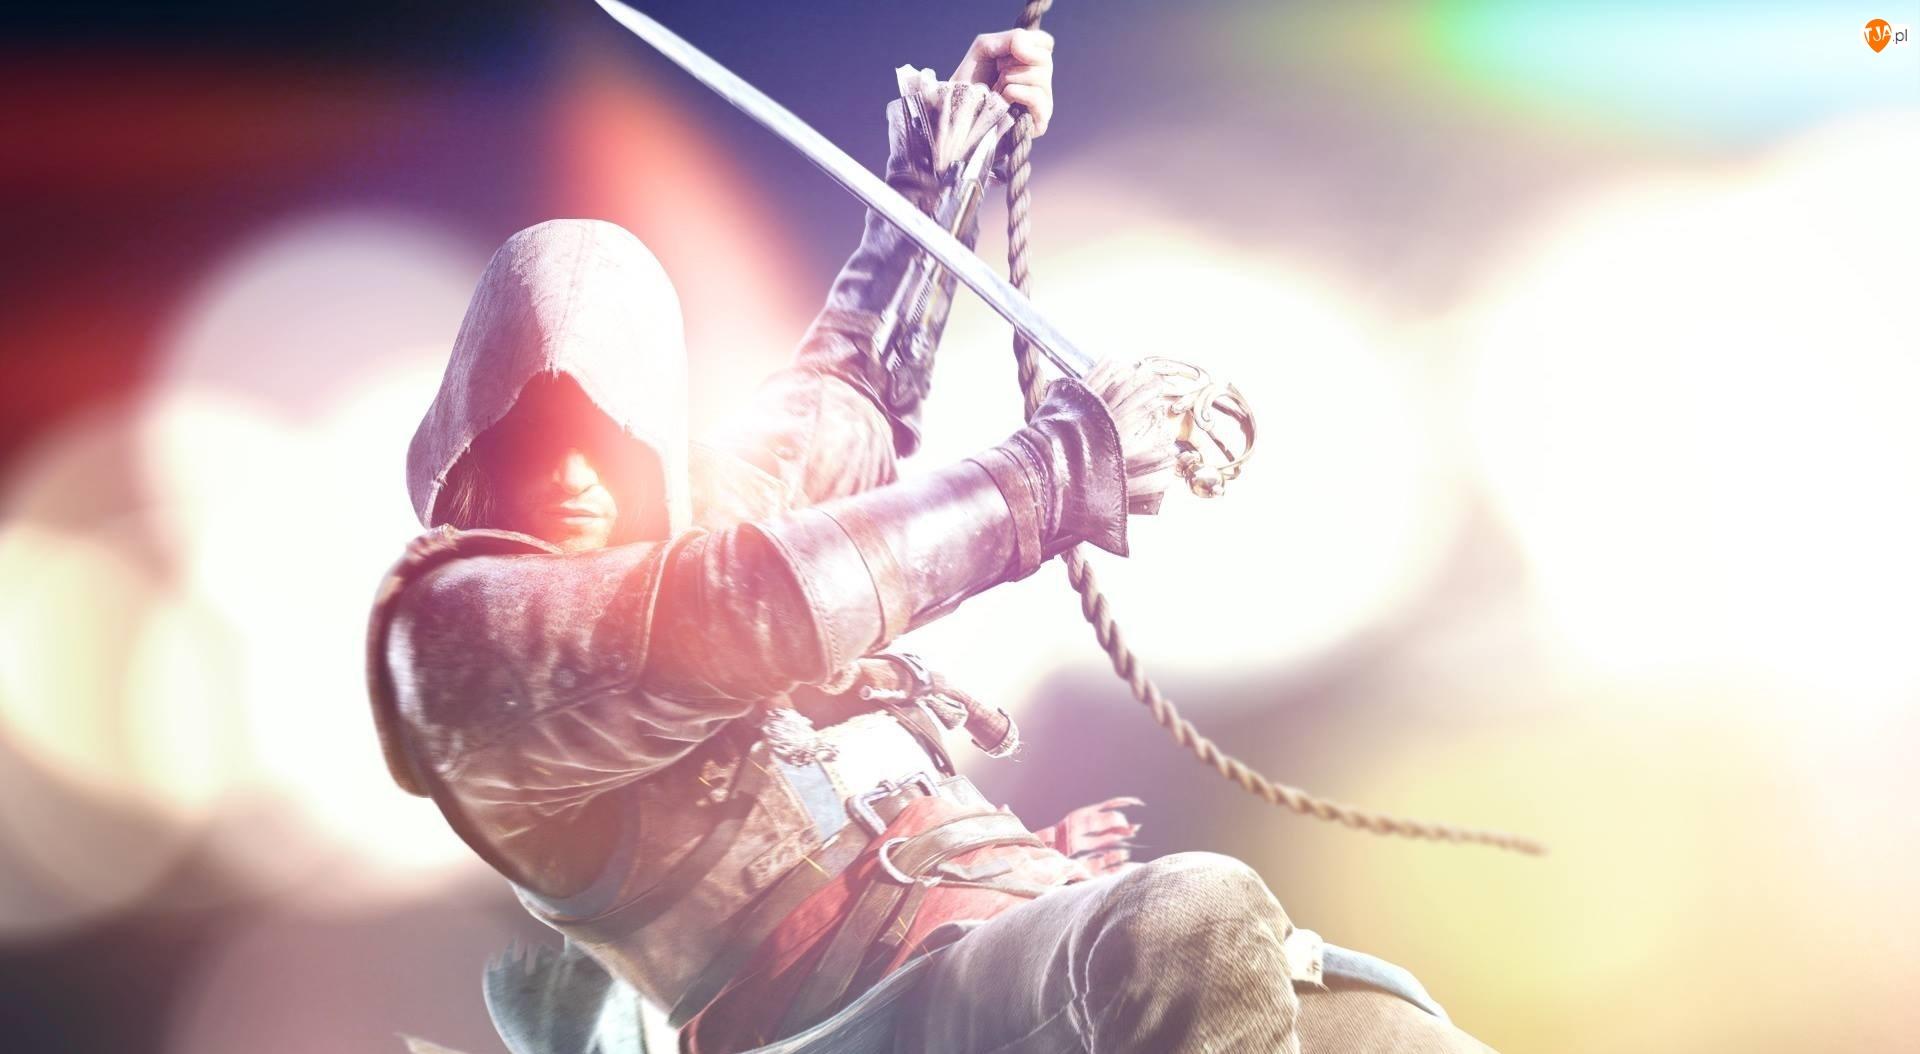 Assassins Creed IV:Blag Flag, Edward Kenway